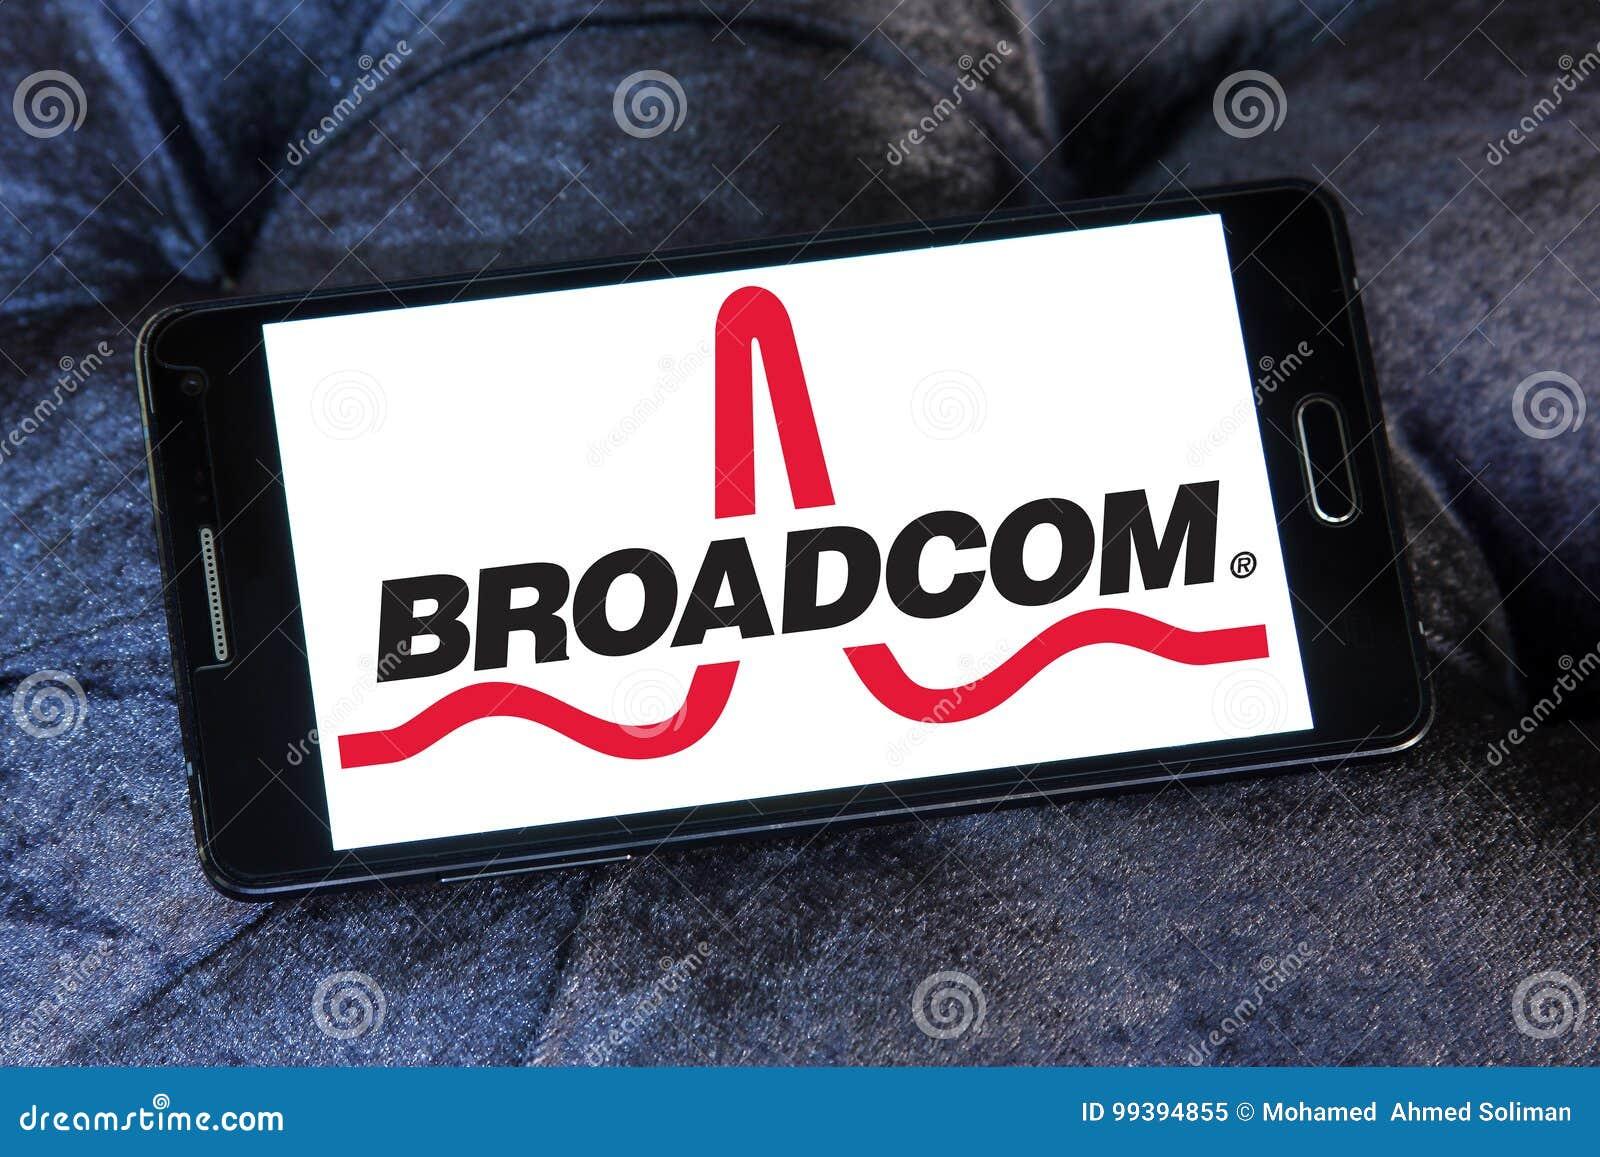 Broadcom company logo editorial image  Image of american